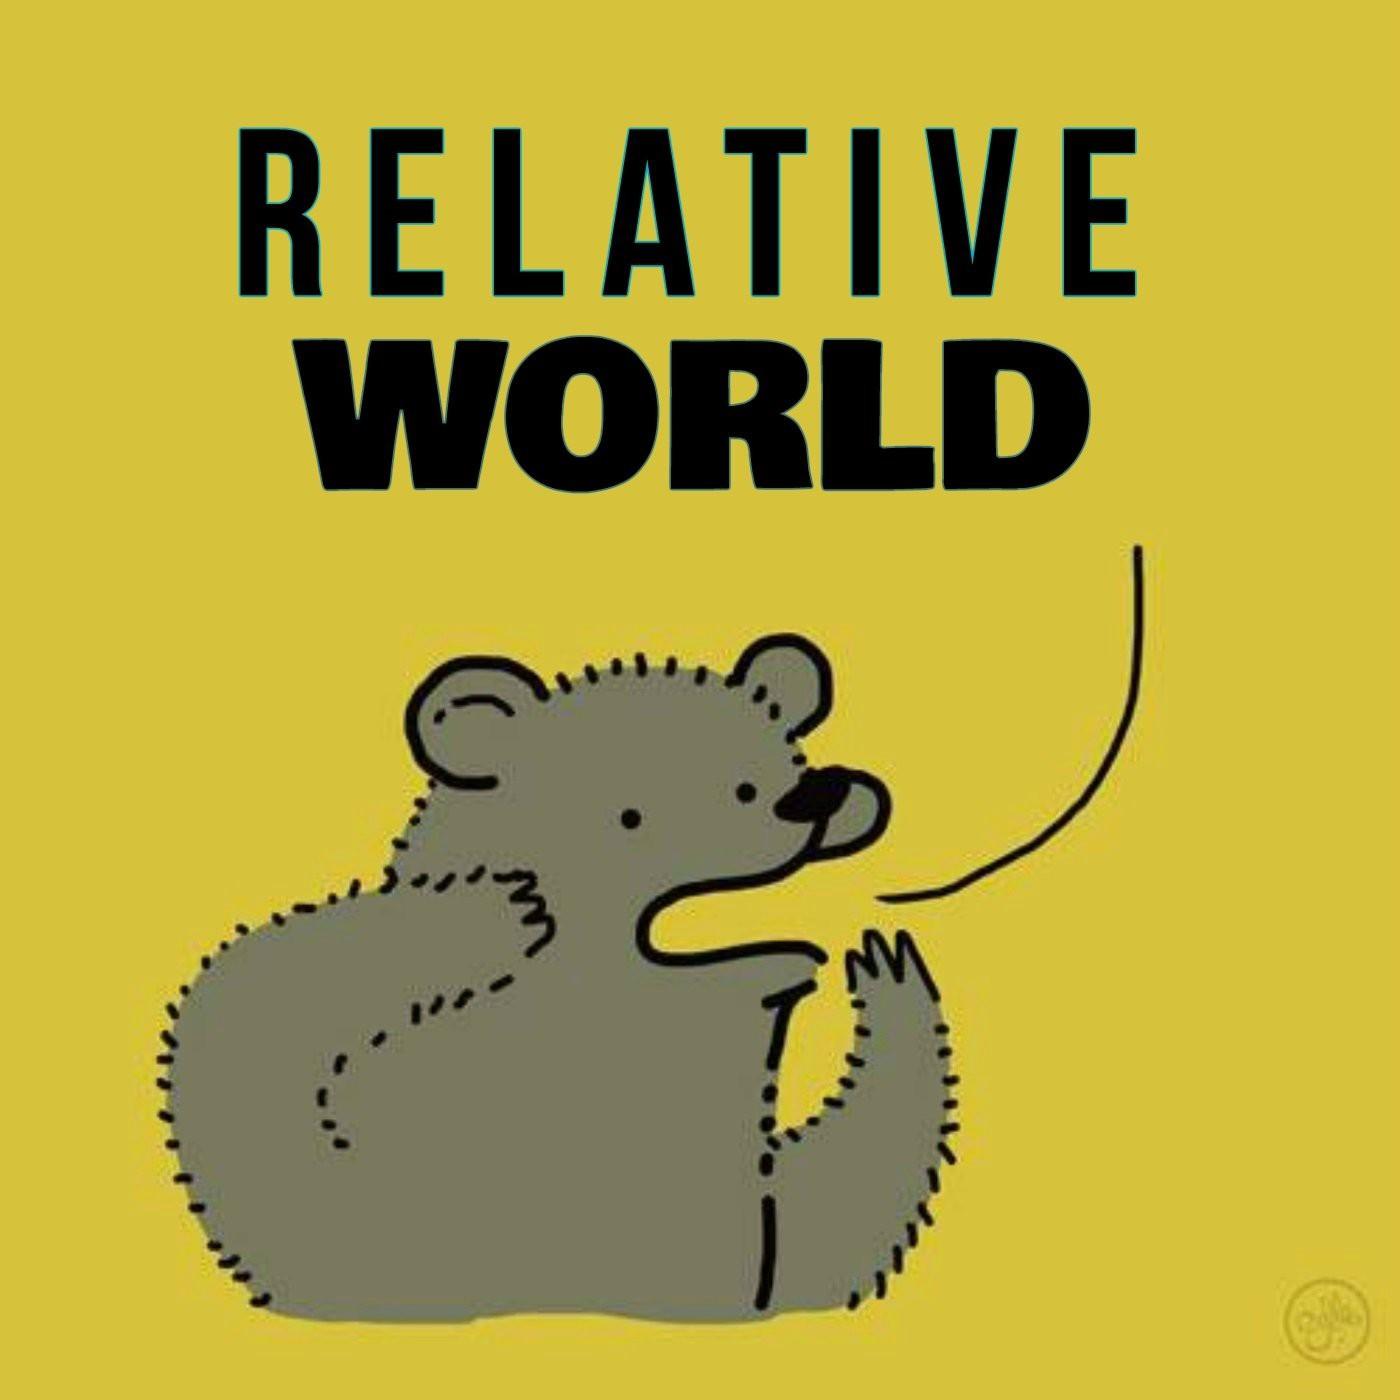 <![CDATA[RelativeWorld ]]>